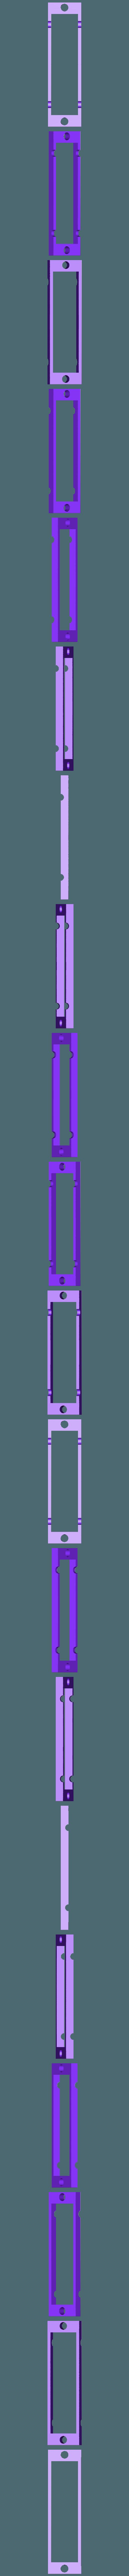 transmission_cap.stl Download free STL file Bulgarian State Railways Series 19 / SGP Austrian in HO (1:87) scale • 3D printer object, nenchev